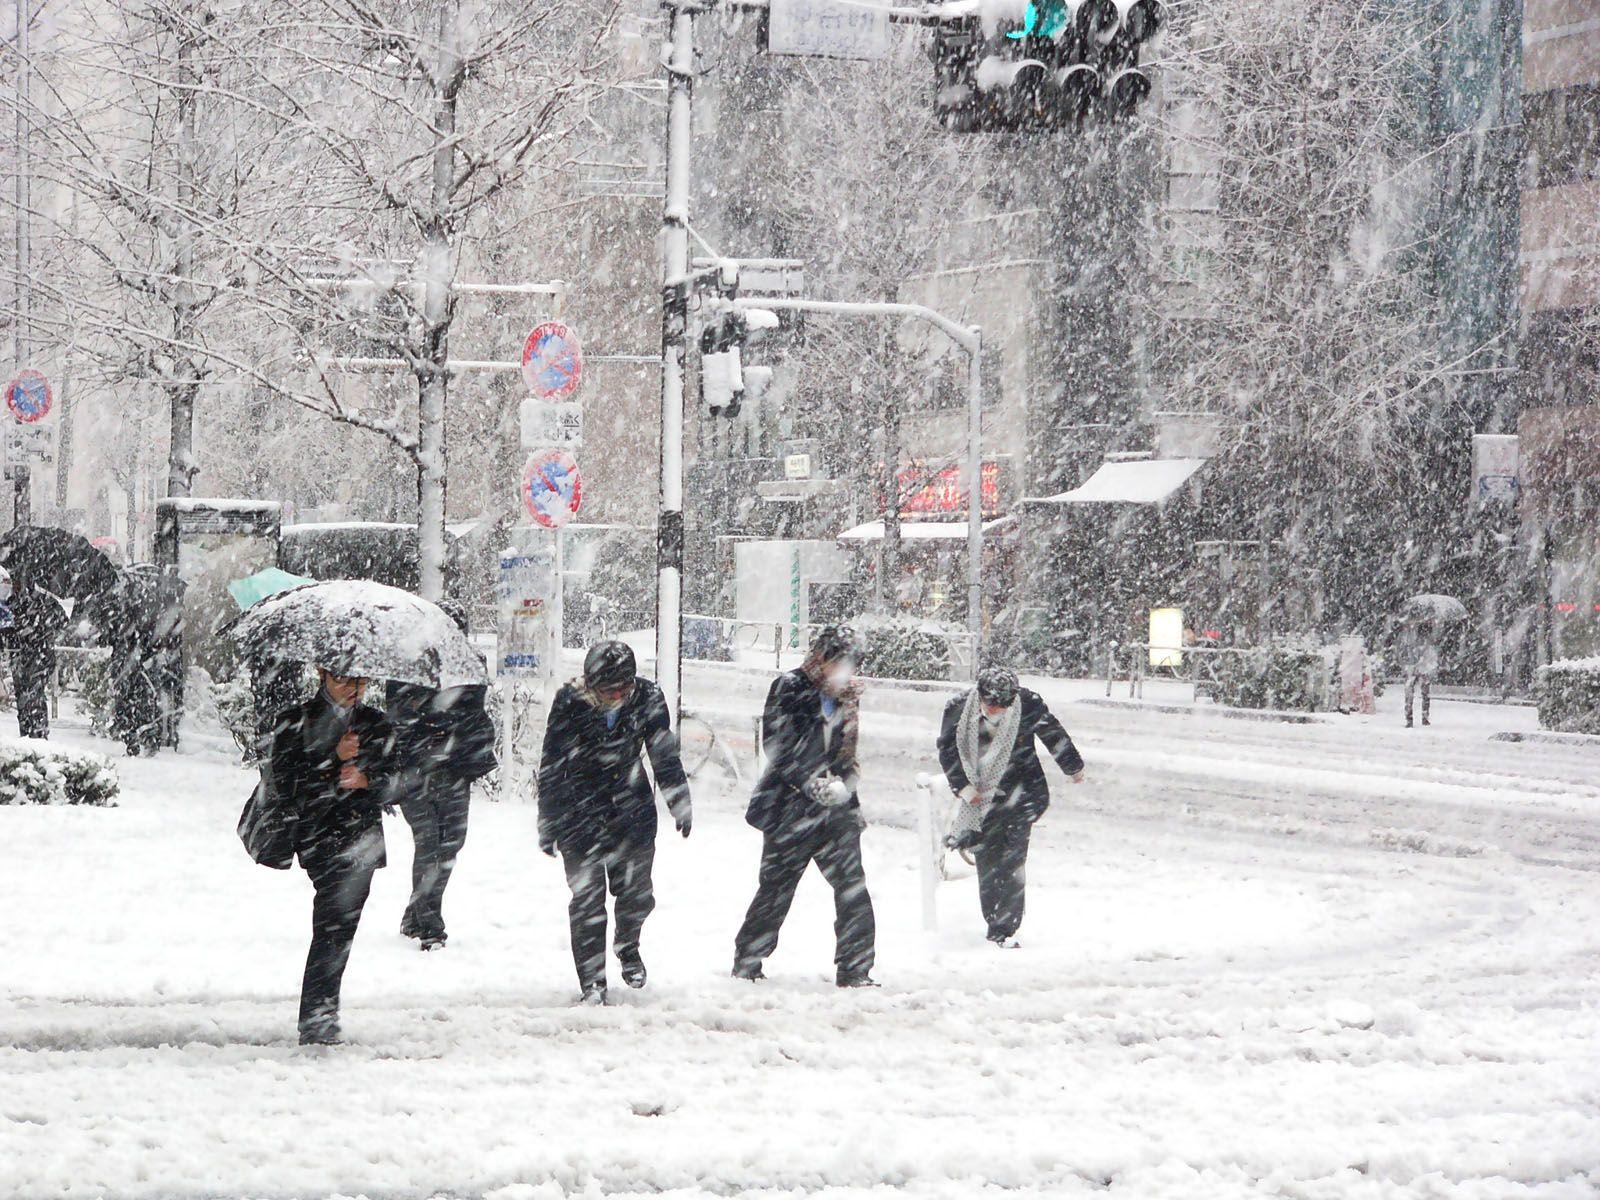 Snow Free Stock Photos